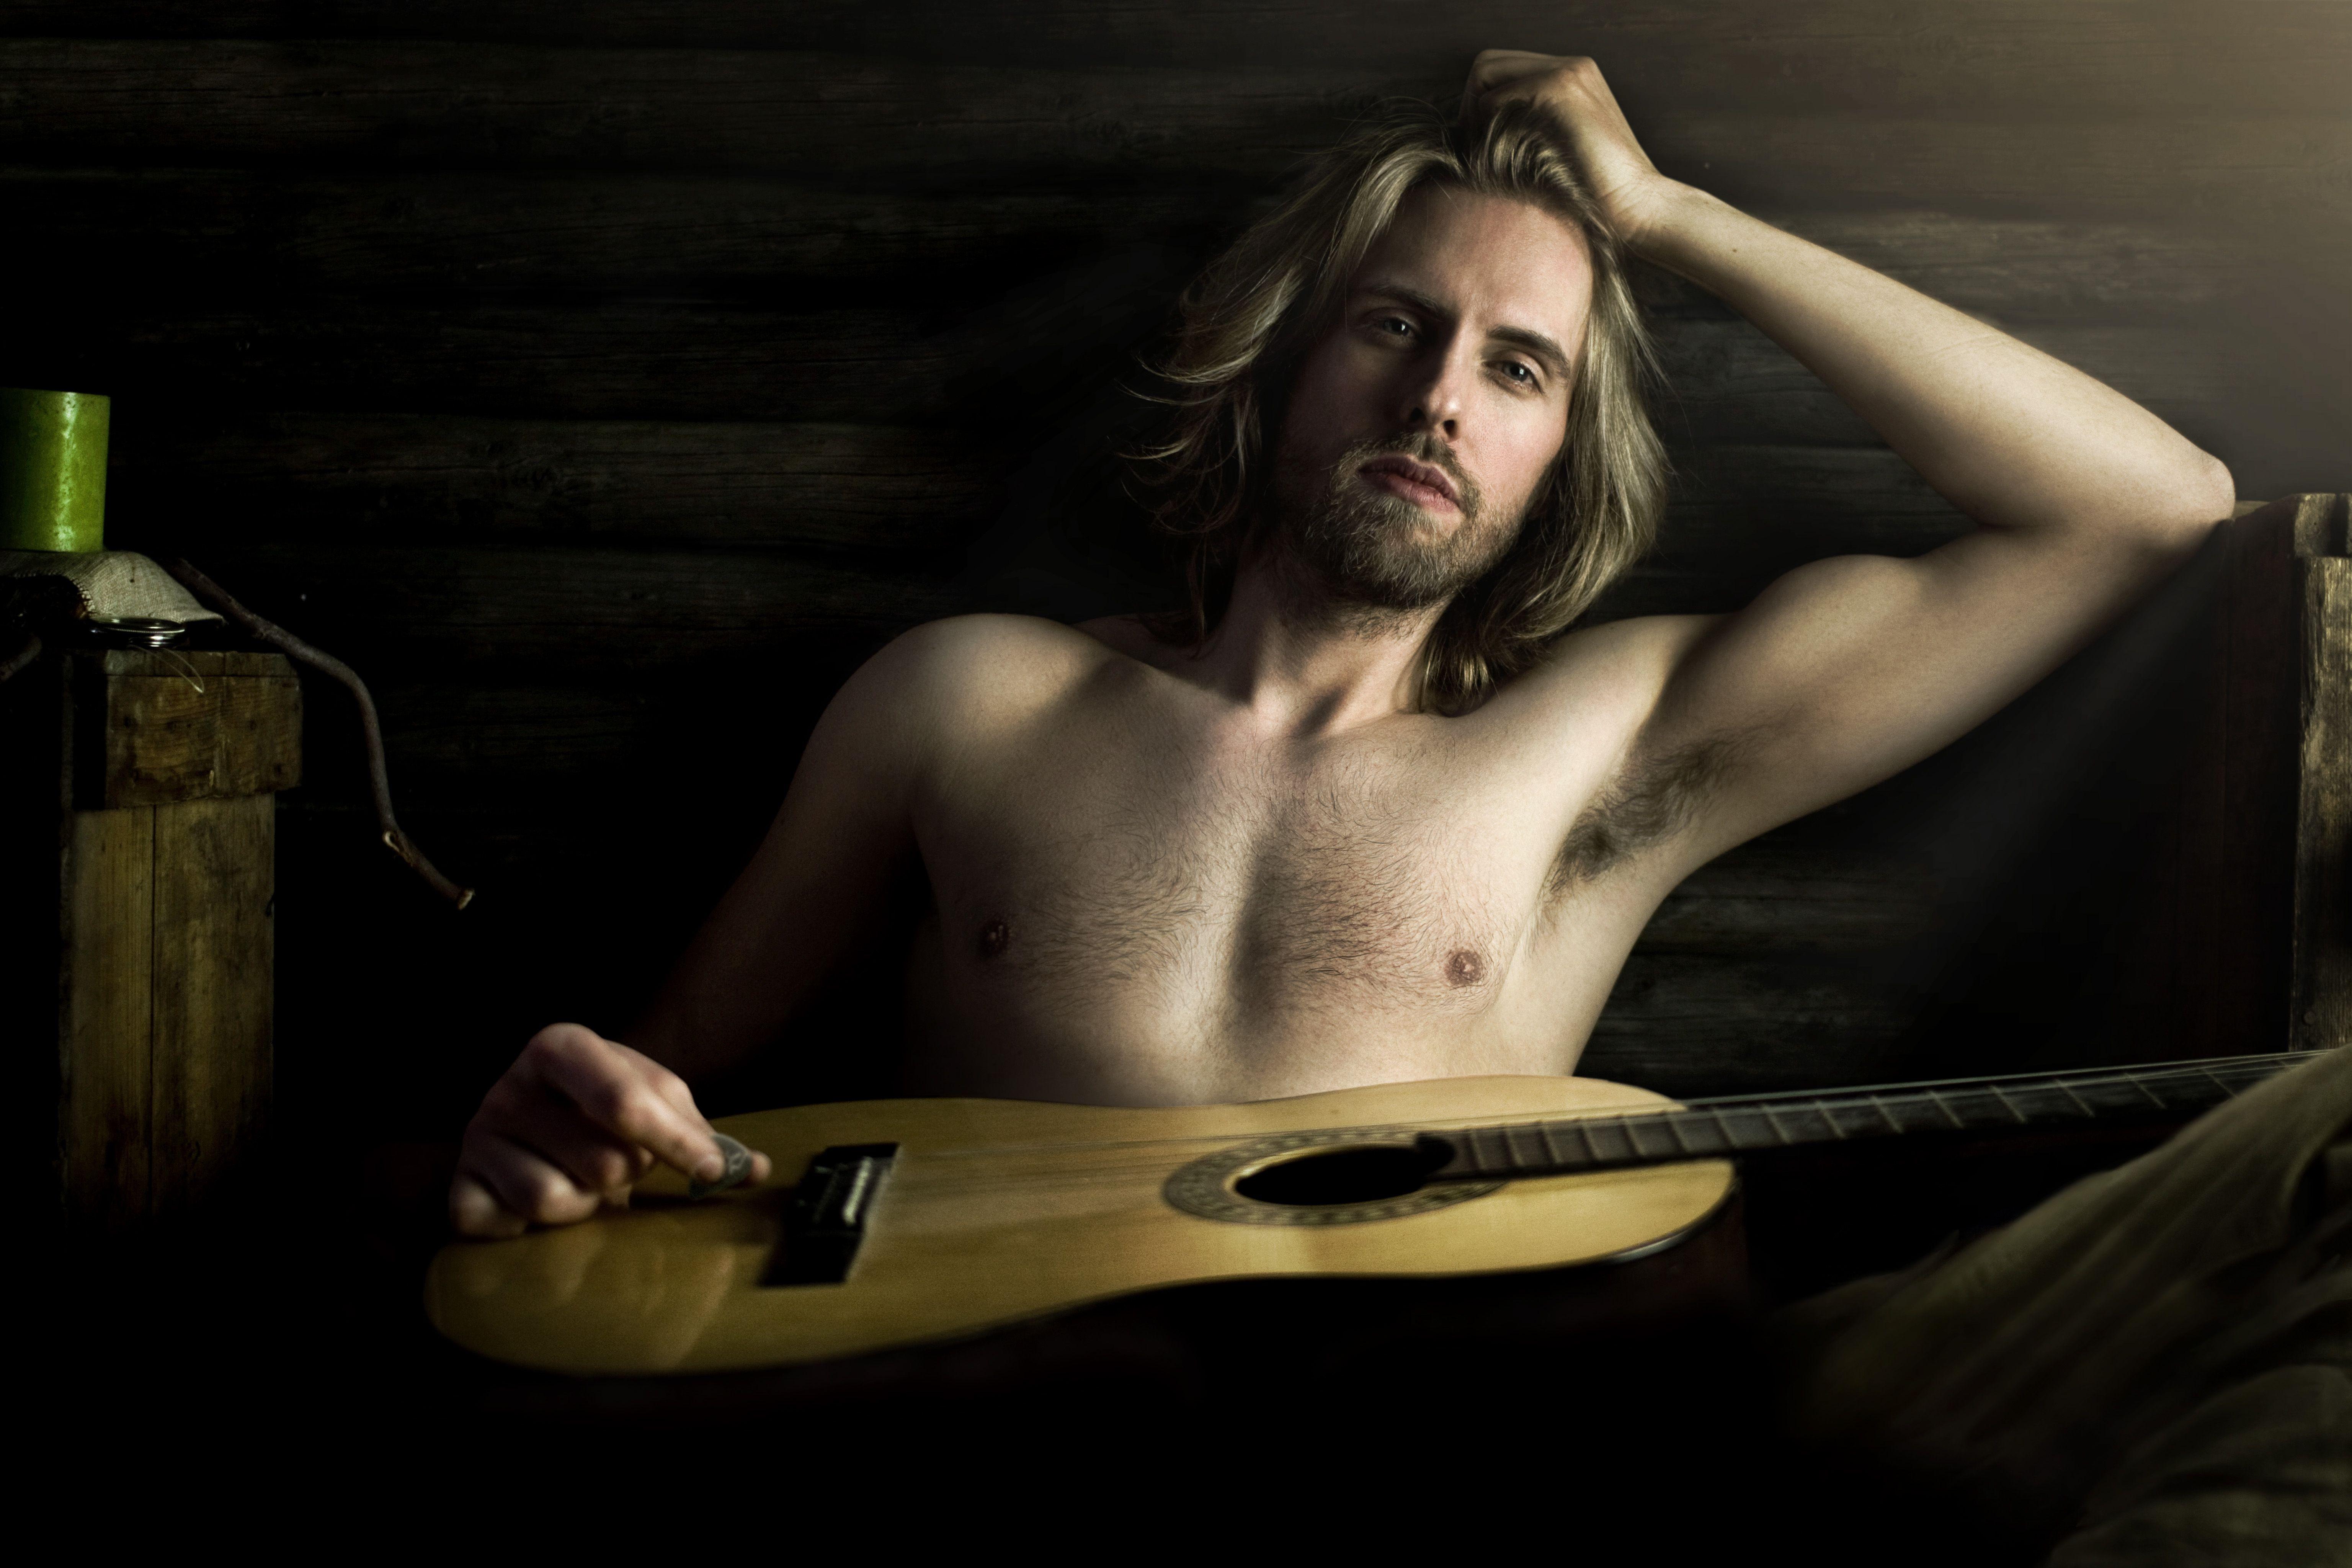 Naked guitar hero